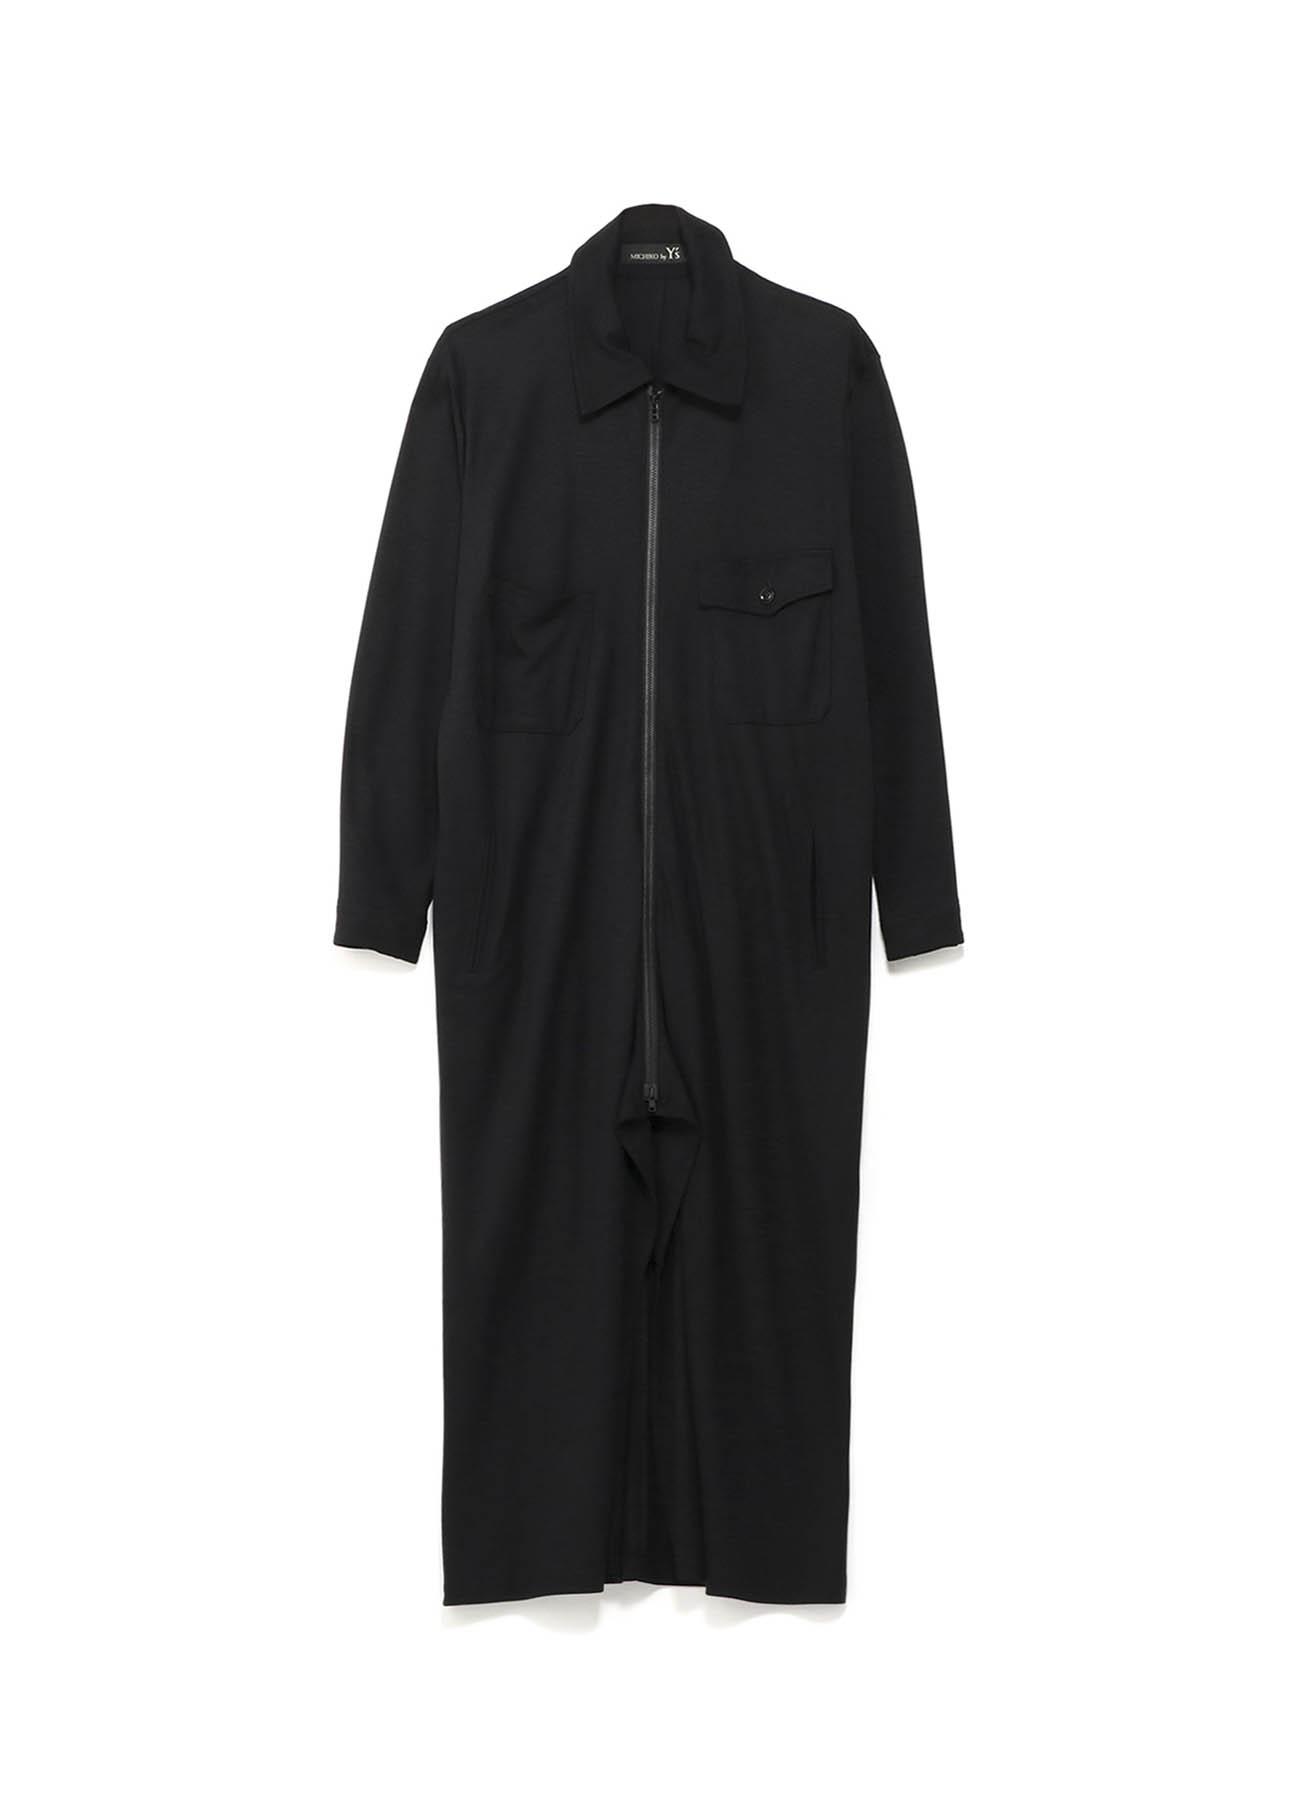 MICHIKObyY's レーヨンウールオリビアスムース つなぎドレス